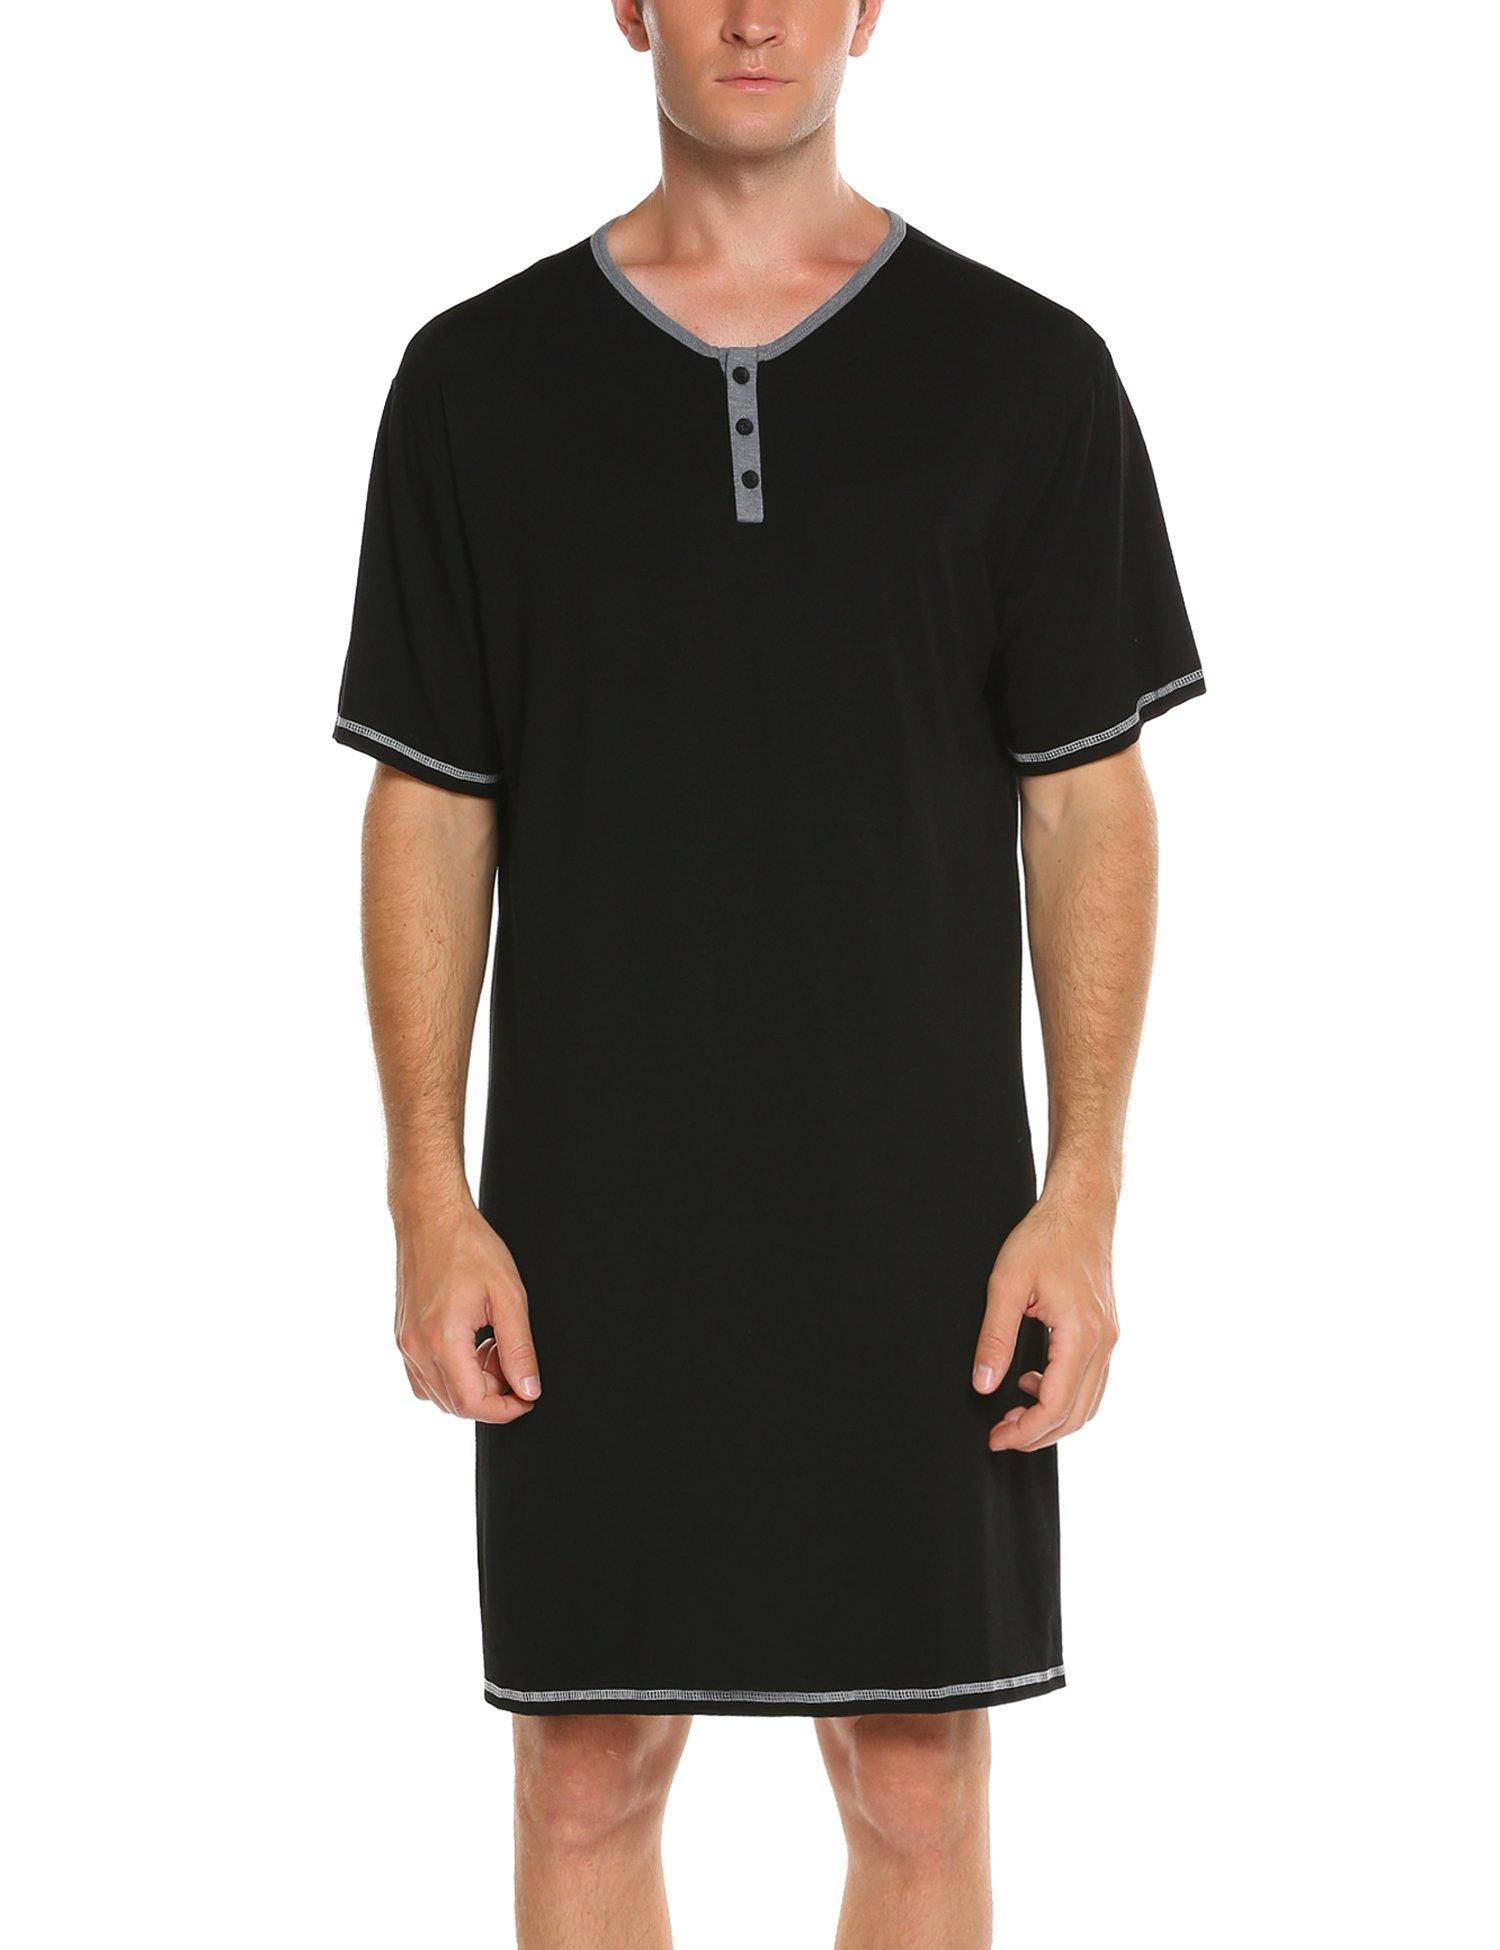 231bdf215a7 Ekouaer Men s Comfort Sleepwear Top Nightshirt Sleep Shirt(Black M)